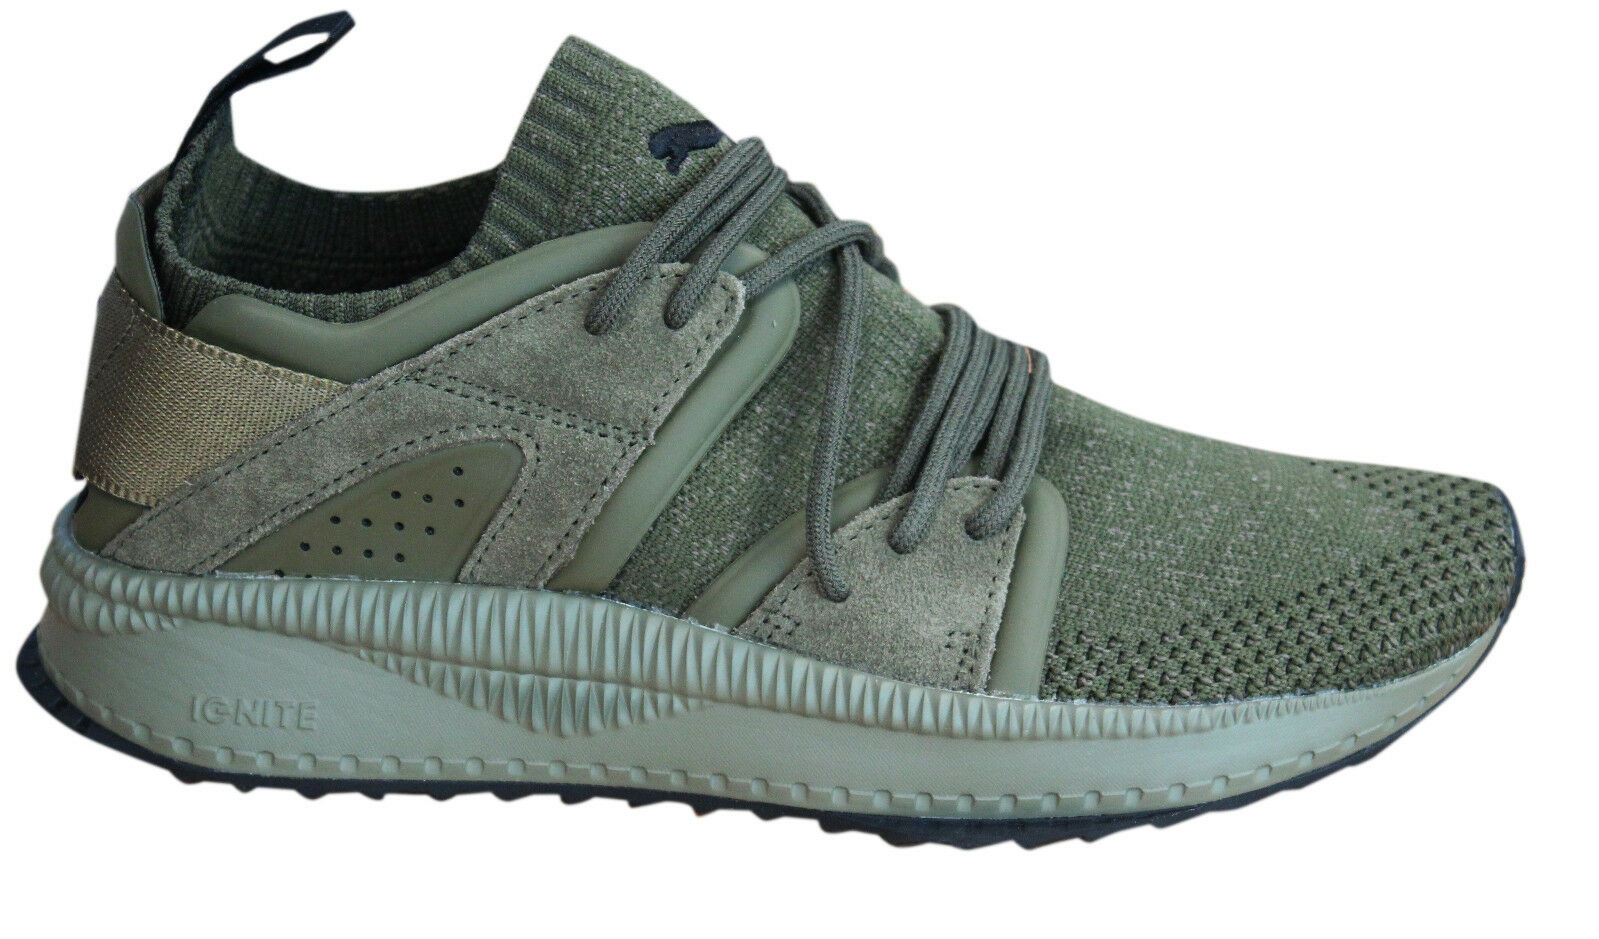 Puma Puma Puma Ignite TSUGI Blaze evoKNIT Mens Trainers Lace Up Slip On shoes 364408 03 M2 8028c0